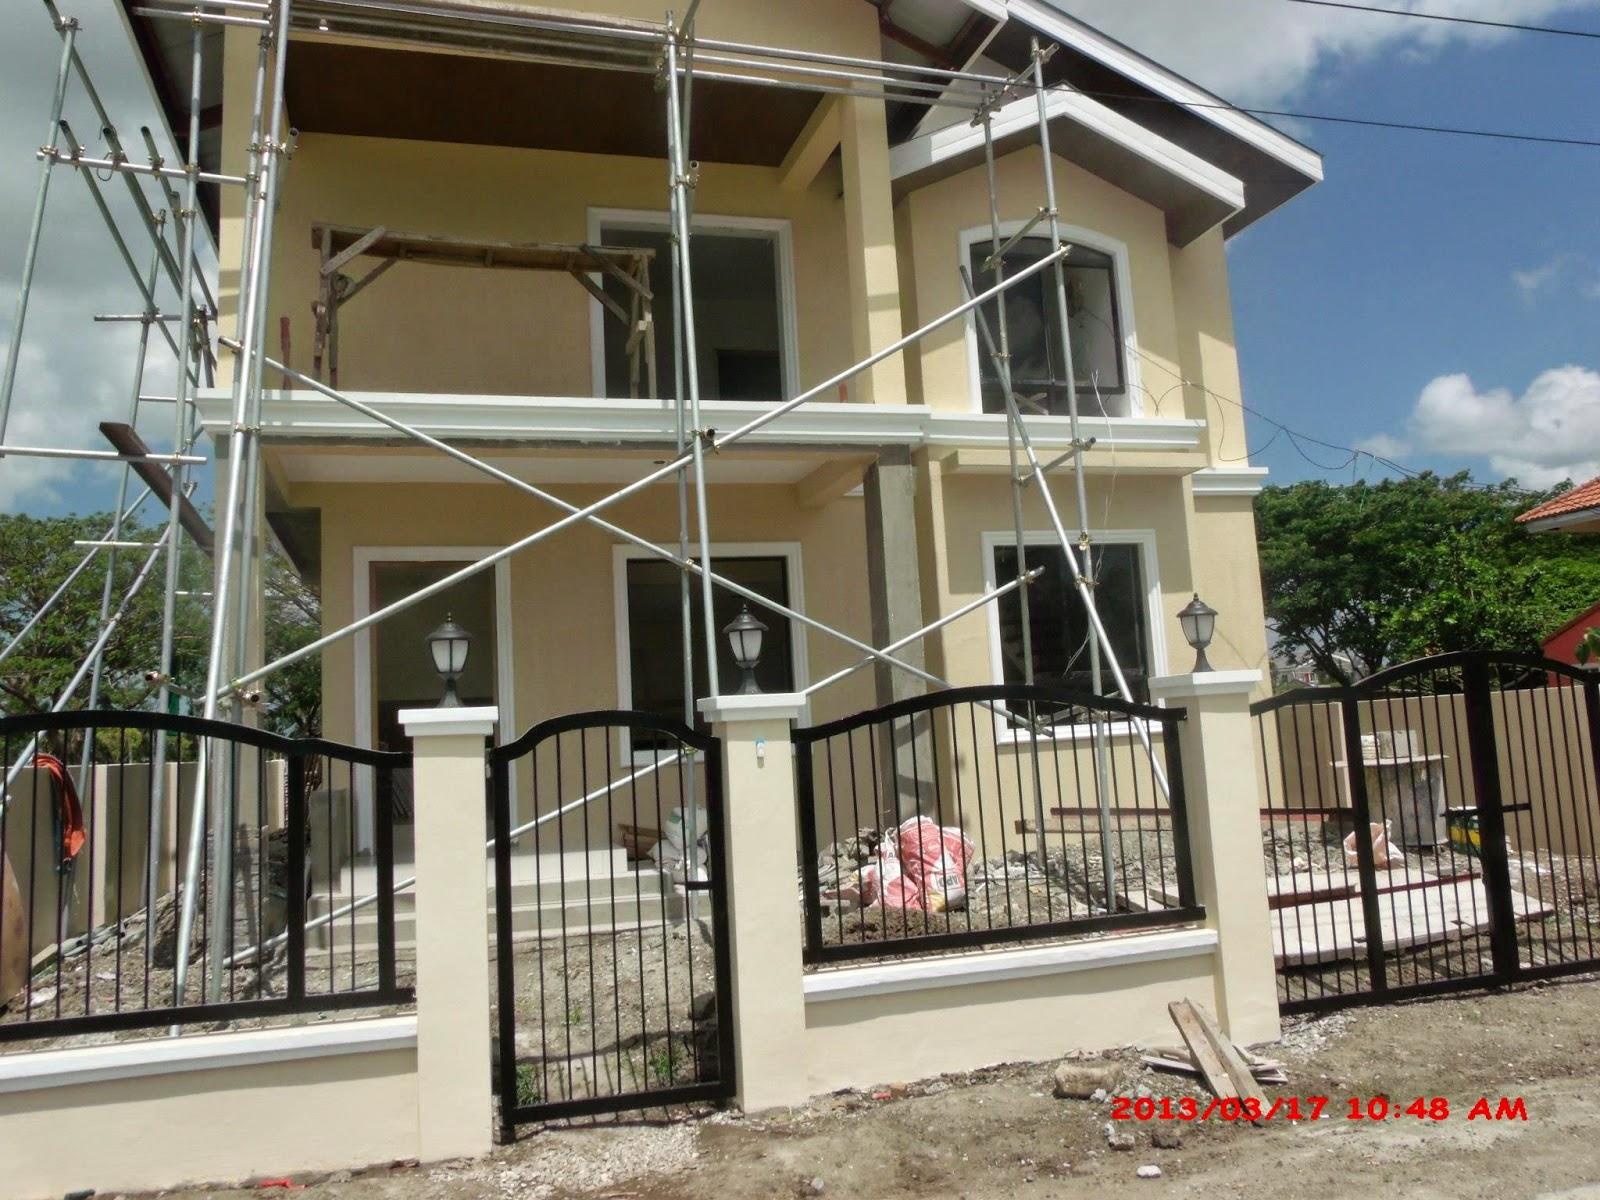 Savannah Trails house construction project in Oton, Iloilo ...